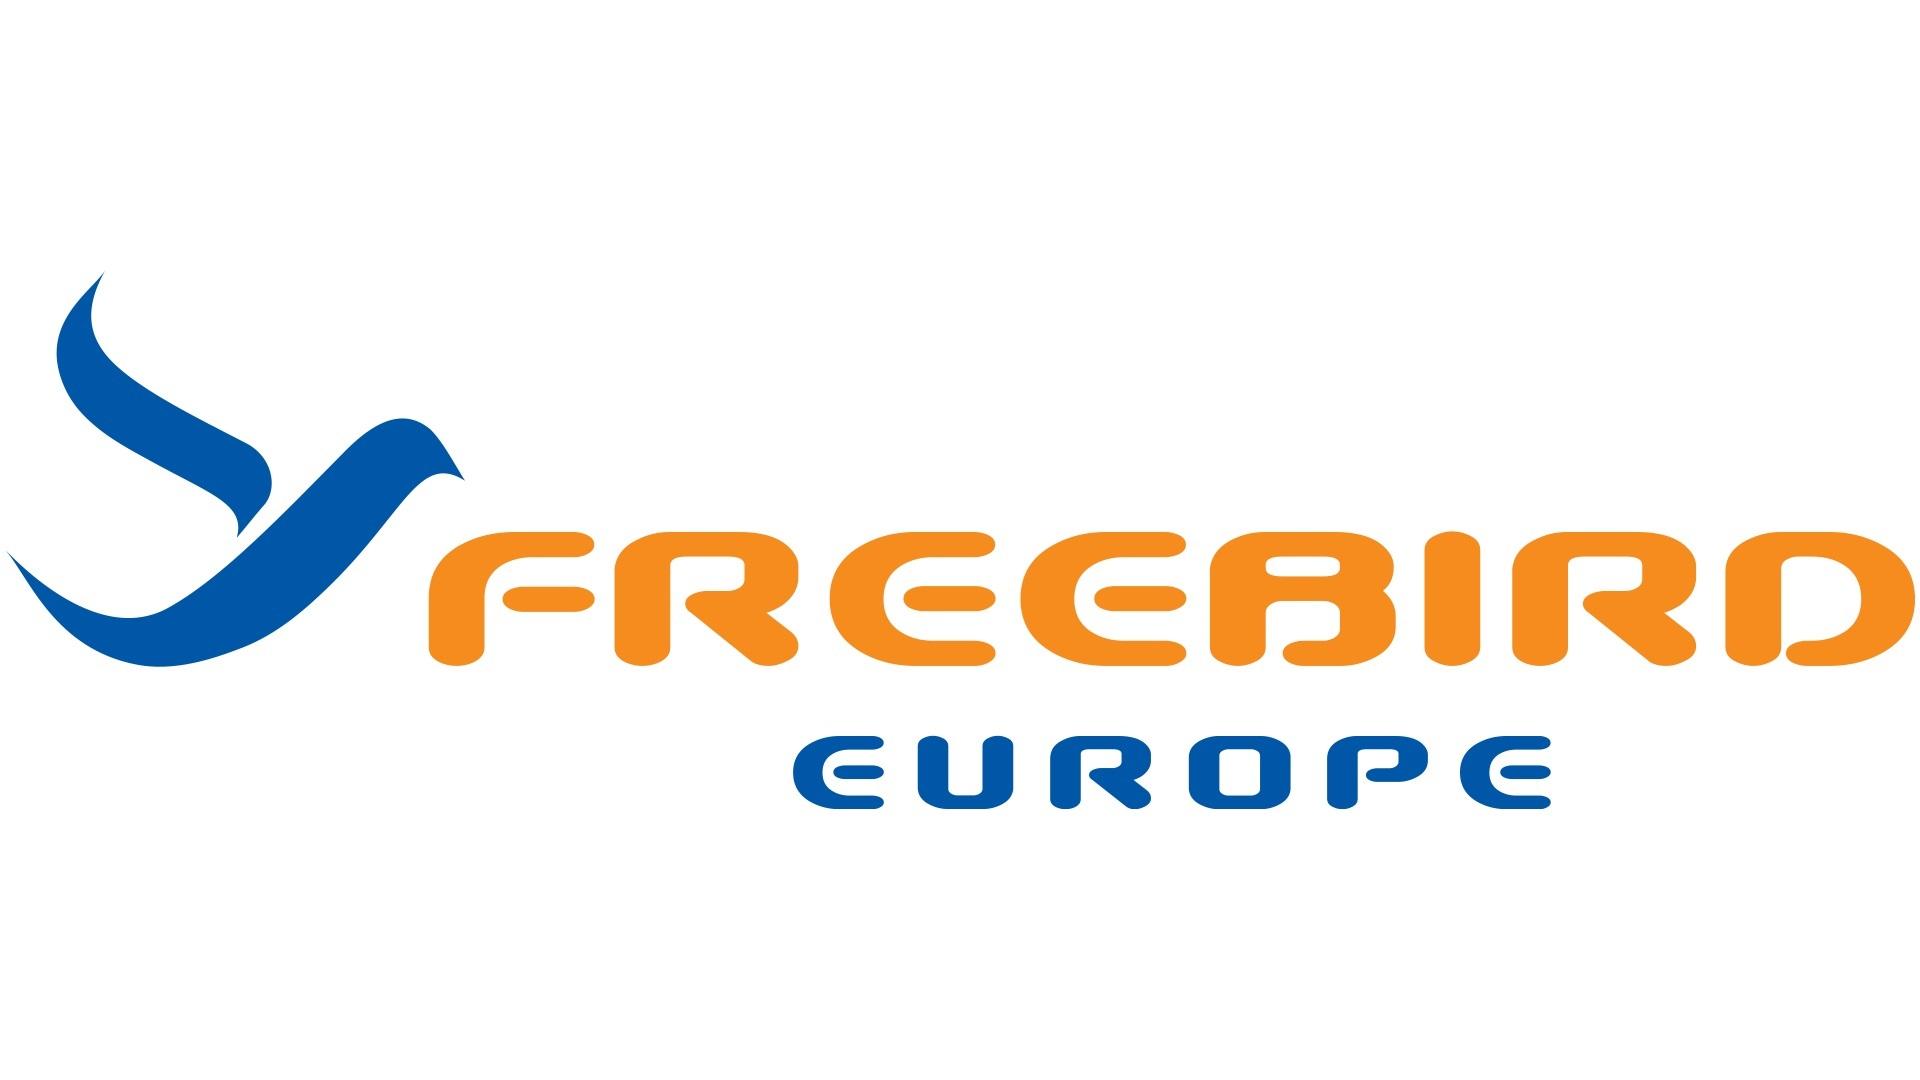 Freebird Airlines Europe logo